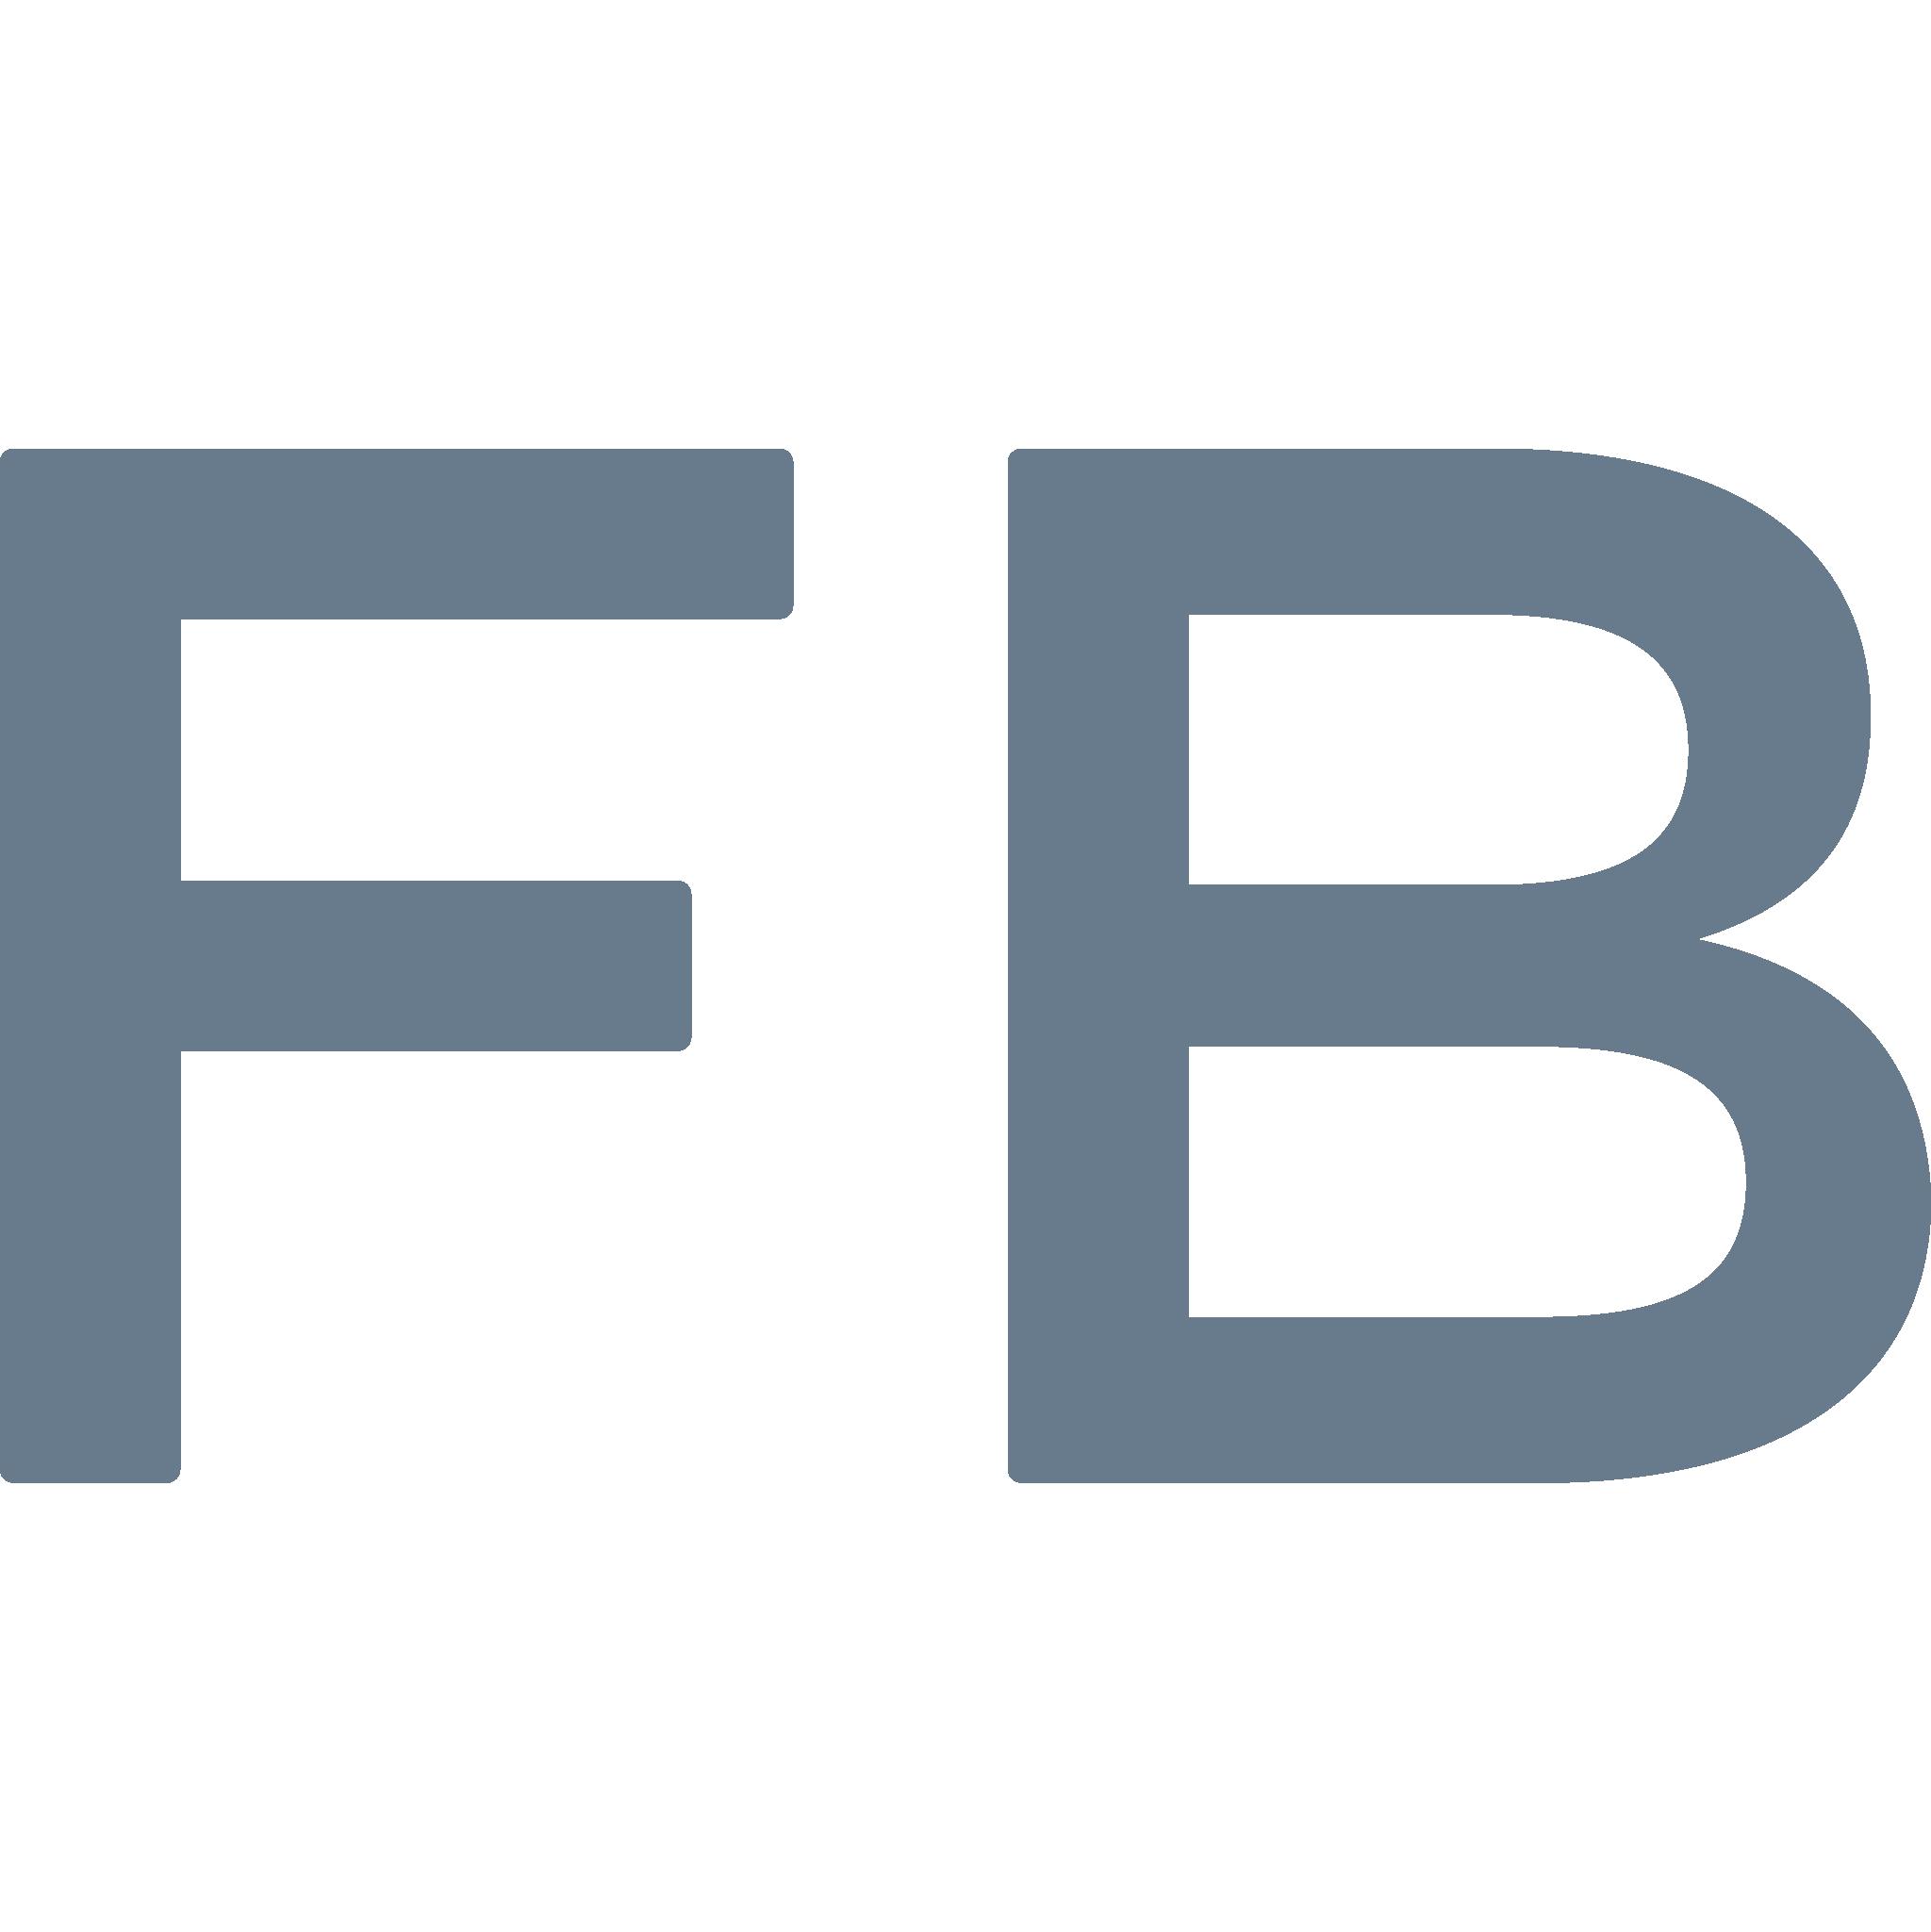 about.fb.com